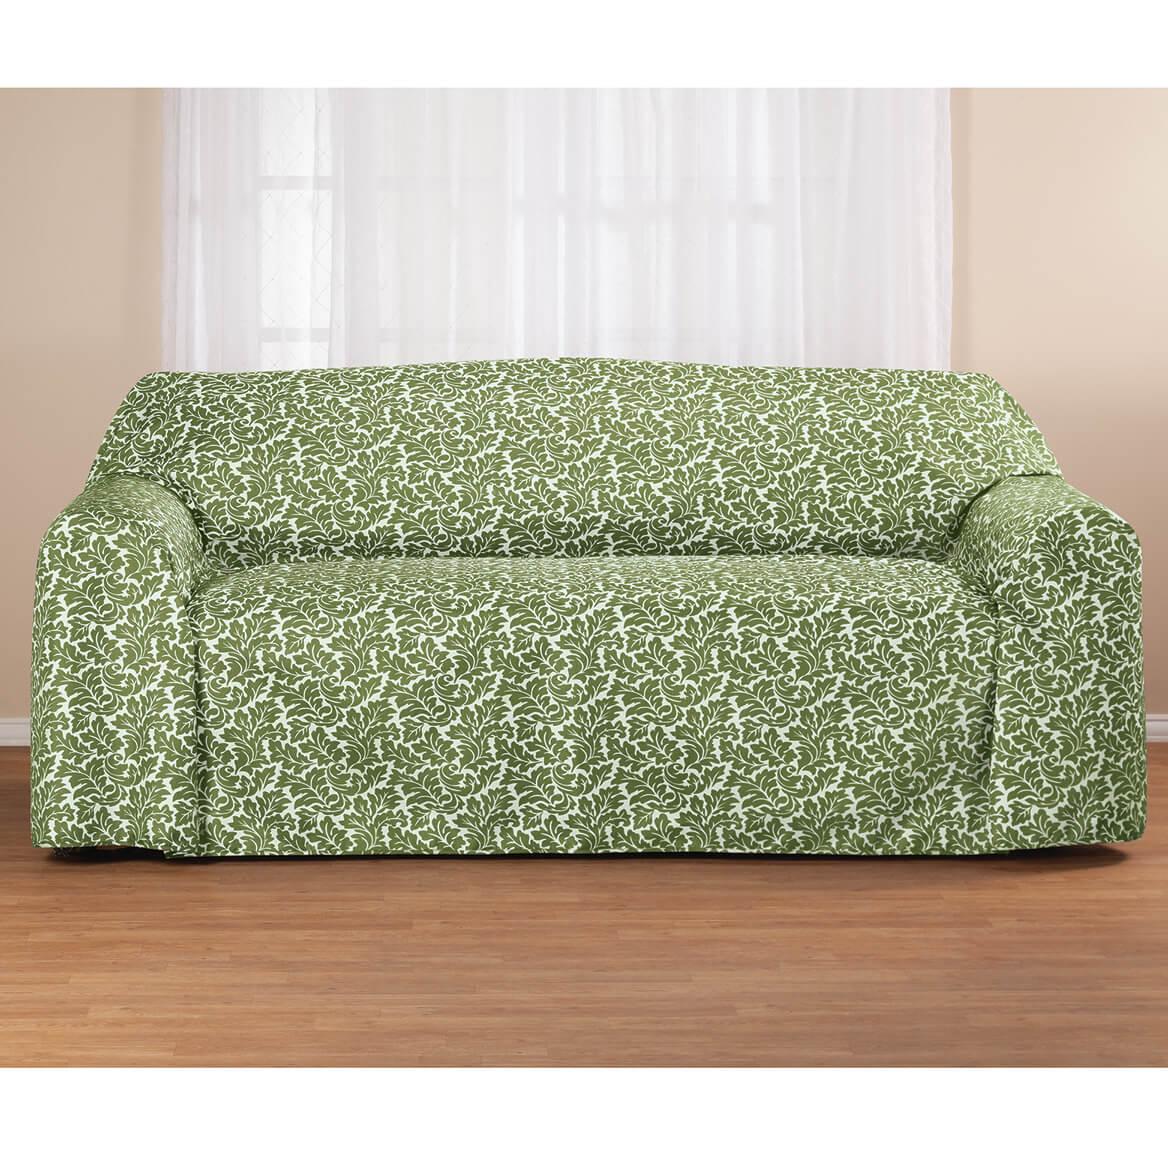 Damask II XL Sofa Throw-363517